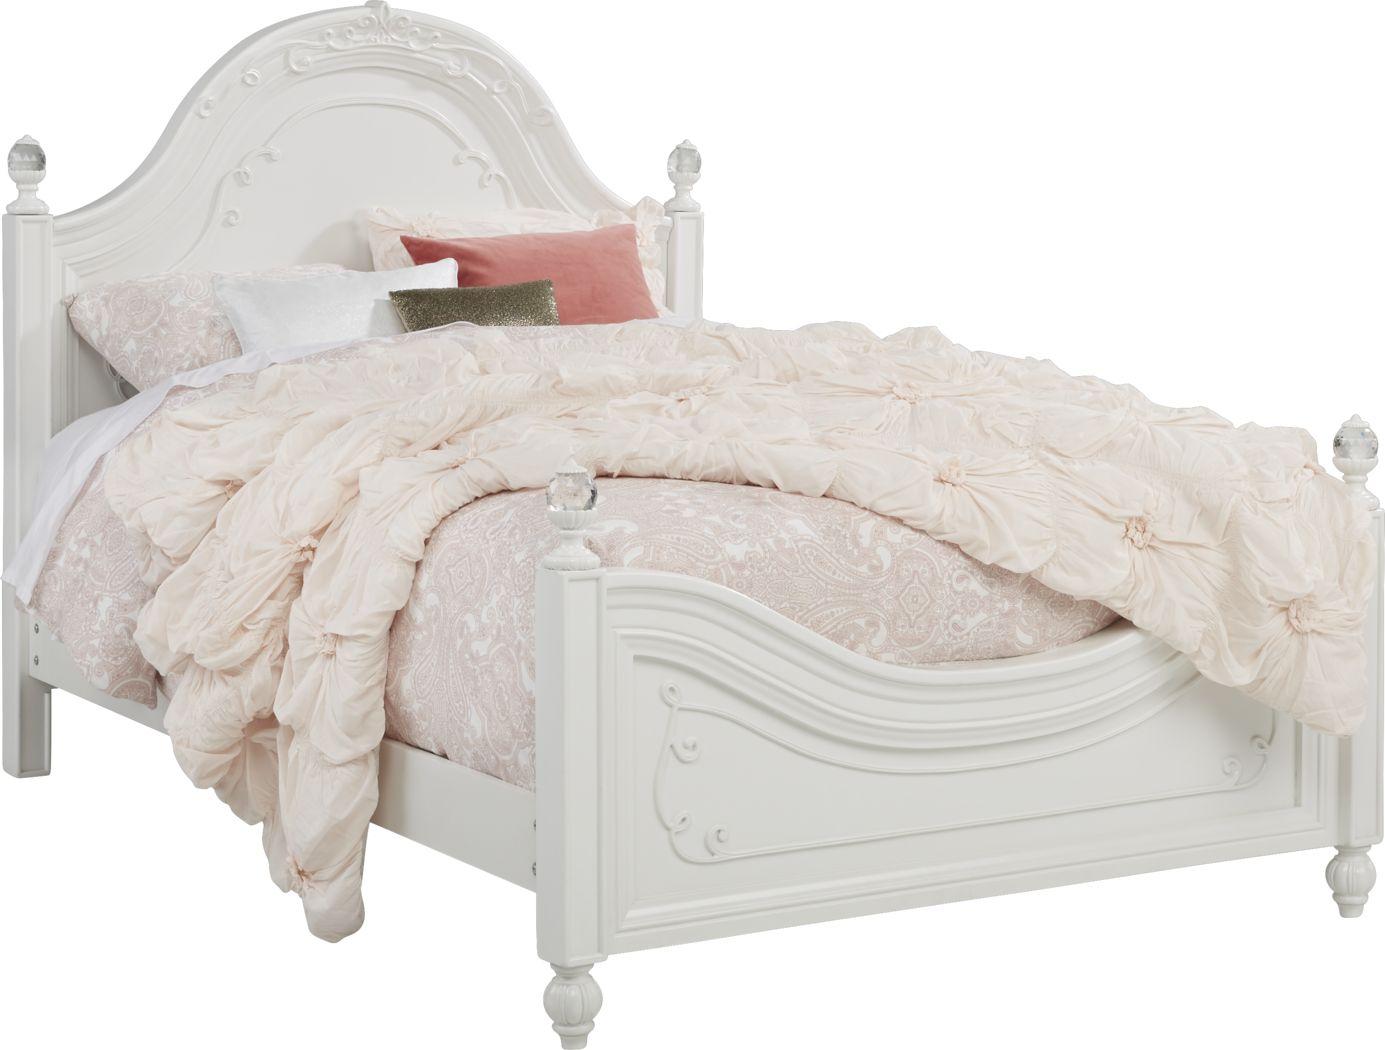 Disney Princess Dreamer White 3 Pc Full Panel Bed Rooms To Go